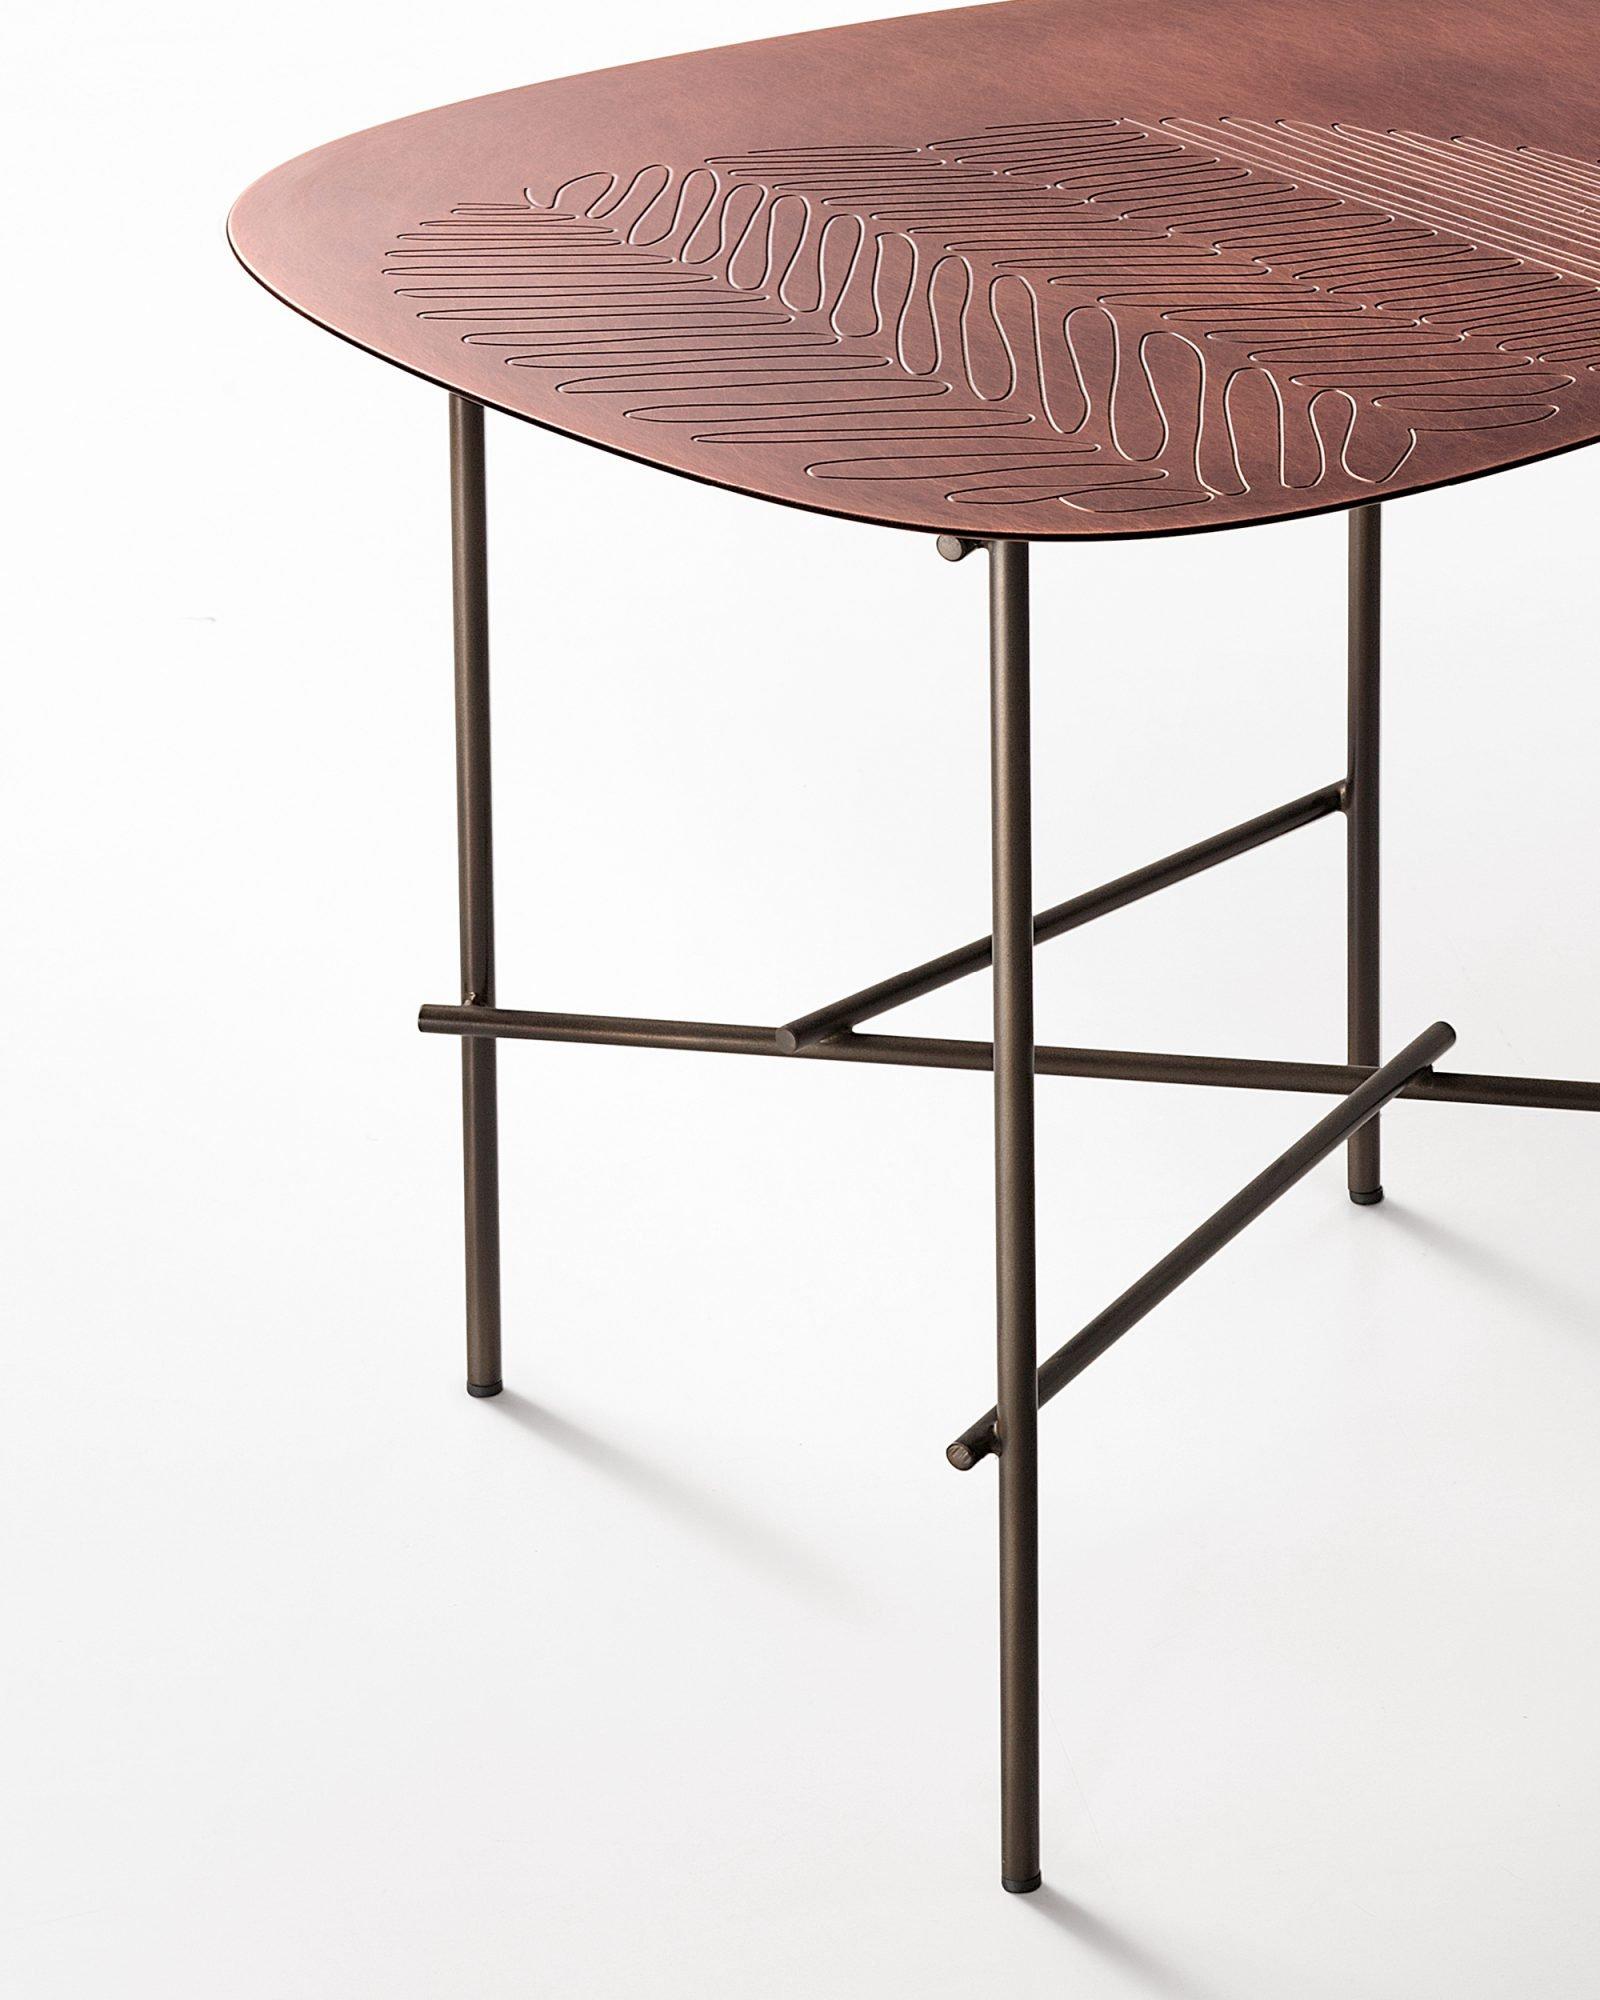 Syro Table end from De Castelli, designed by Emilio Nanni